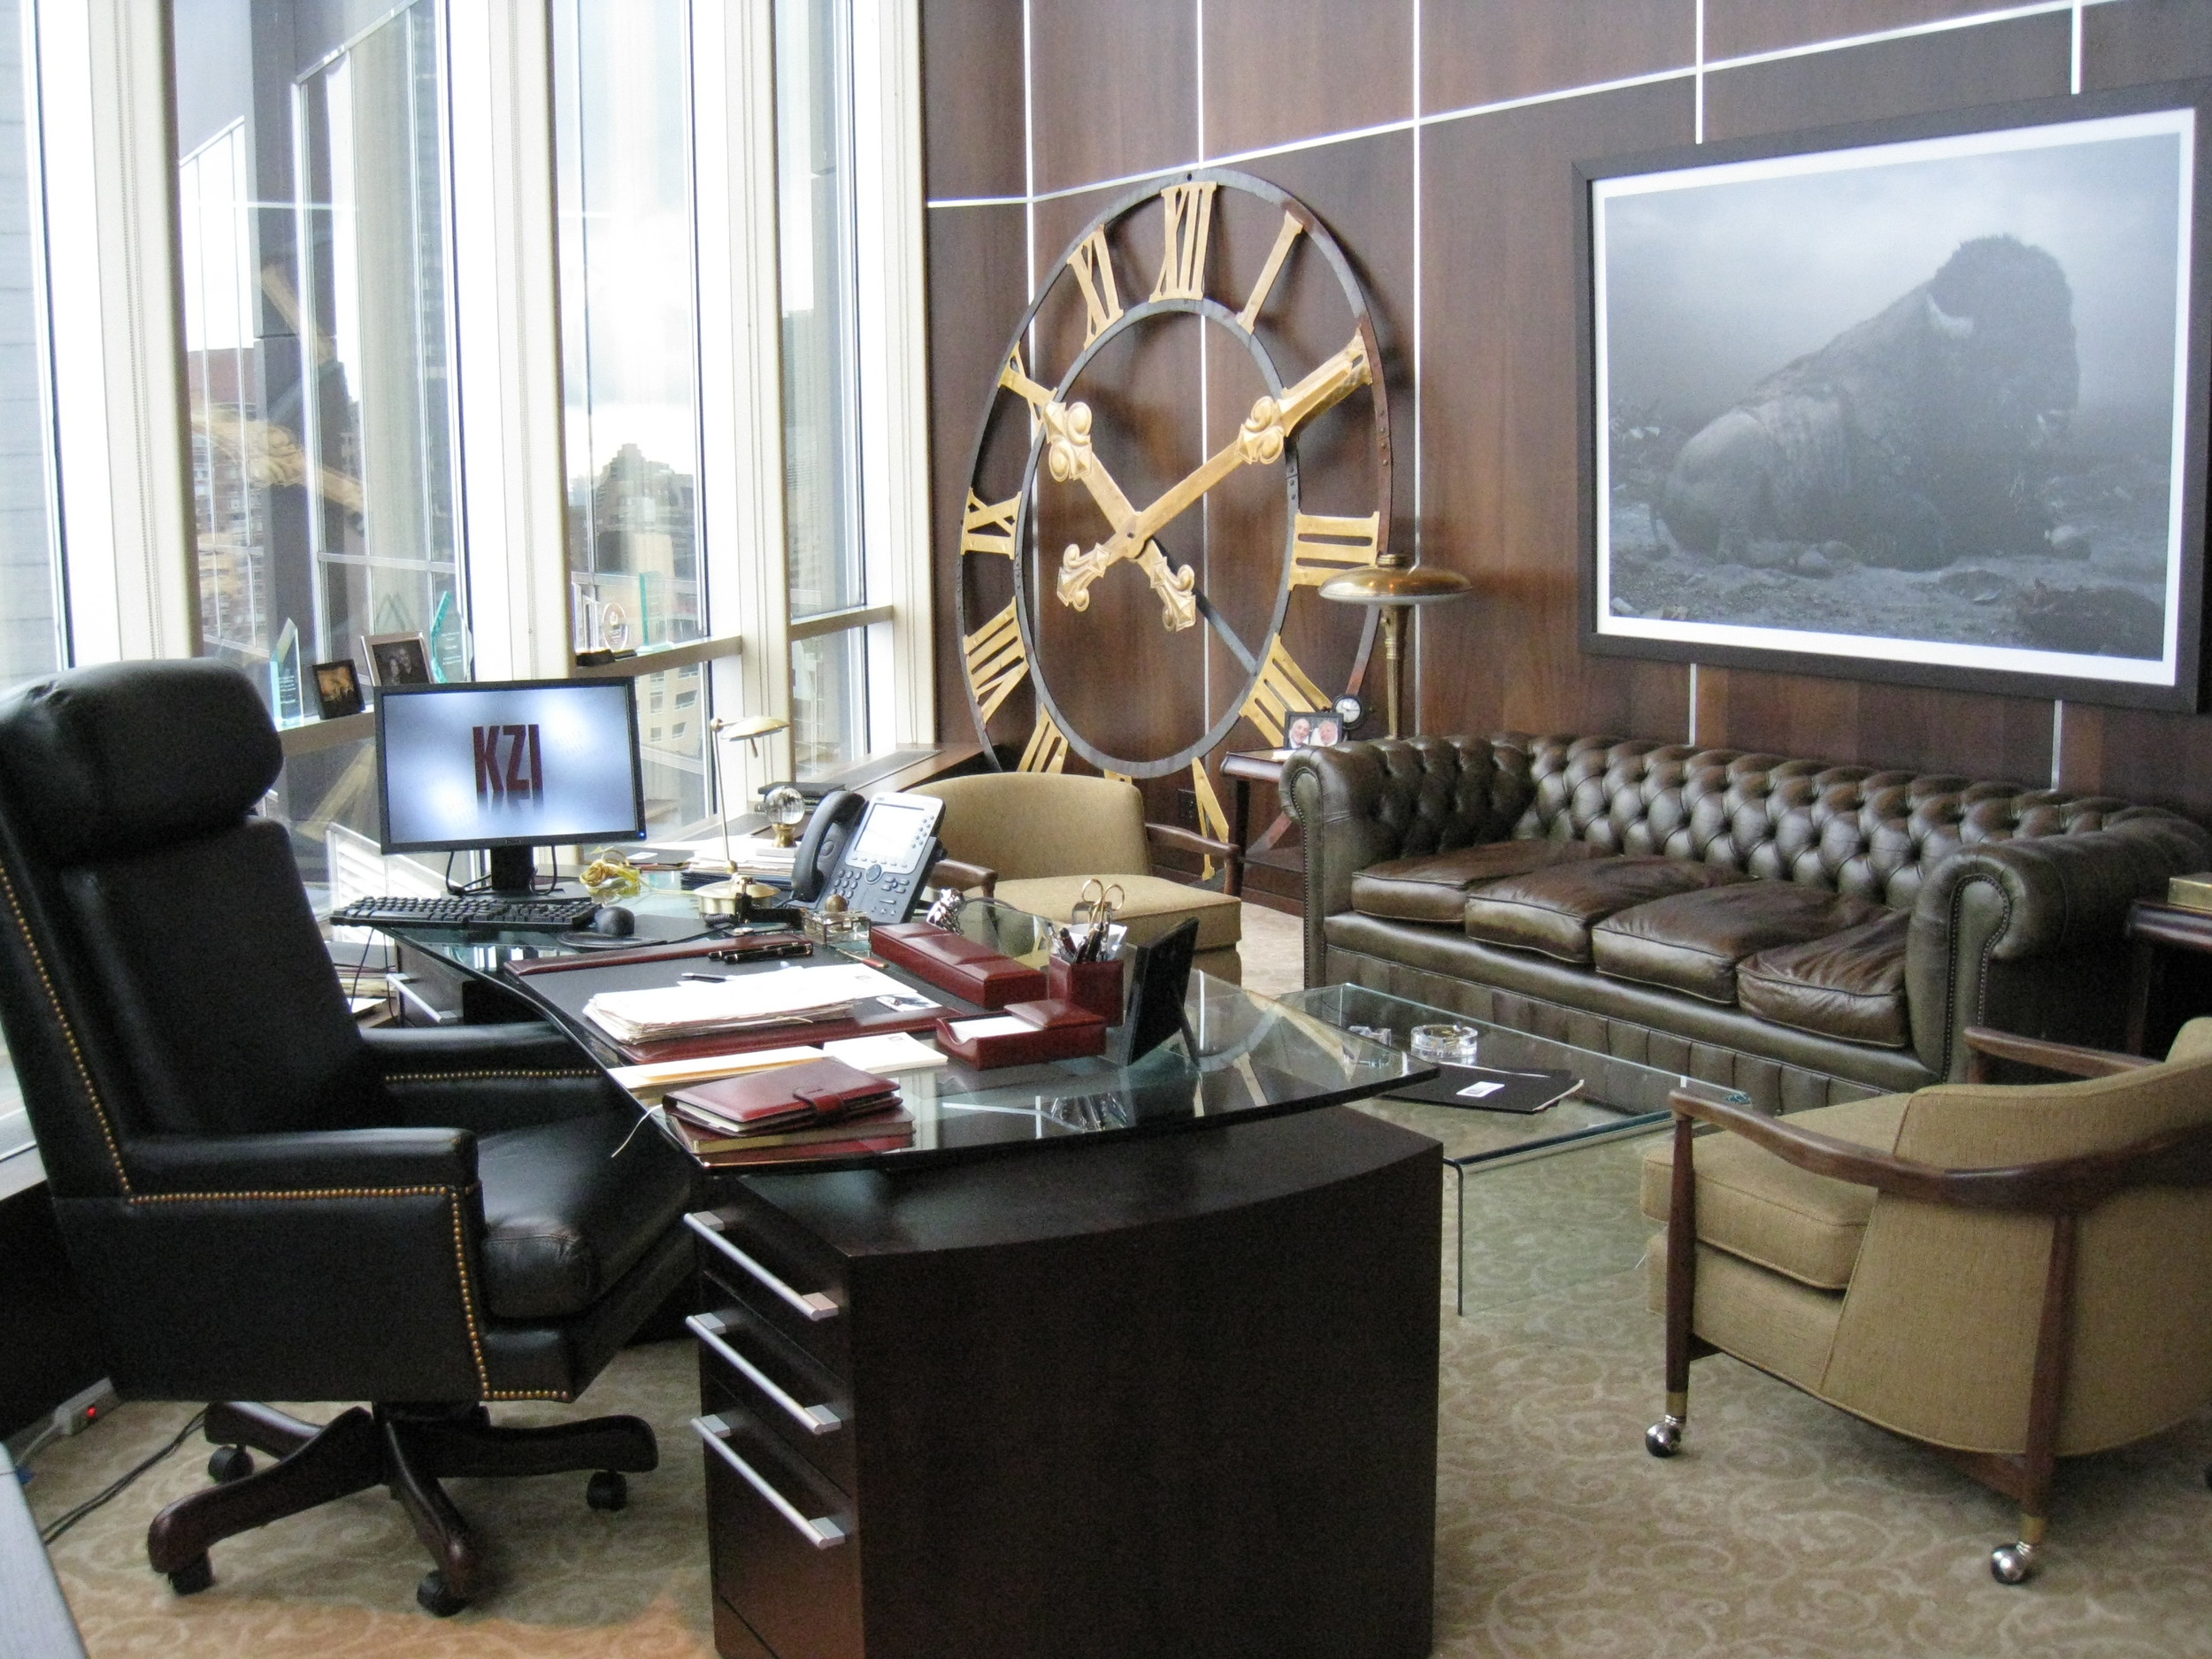 zabel office 3.JPG